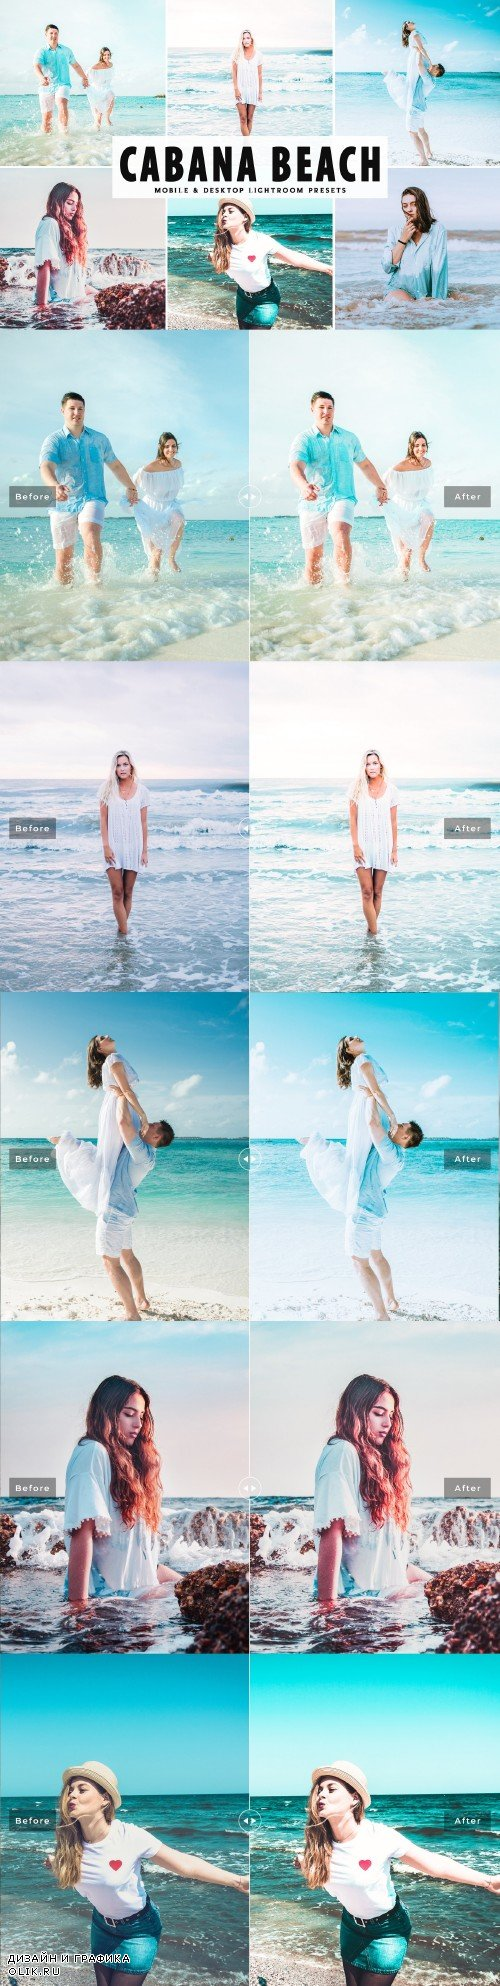 Cabana Beach LRM Presets - 3970014